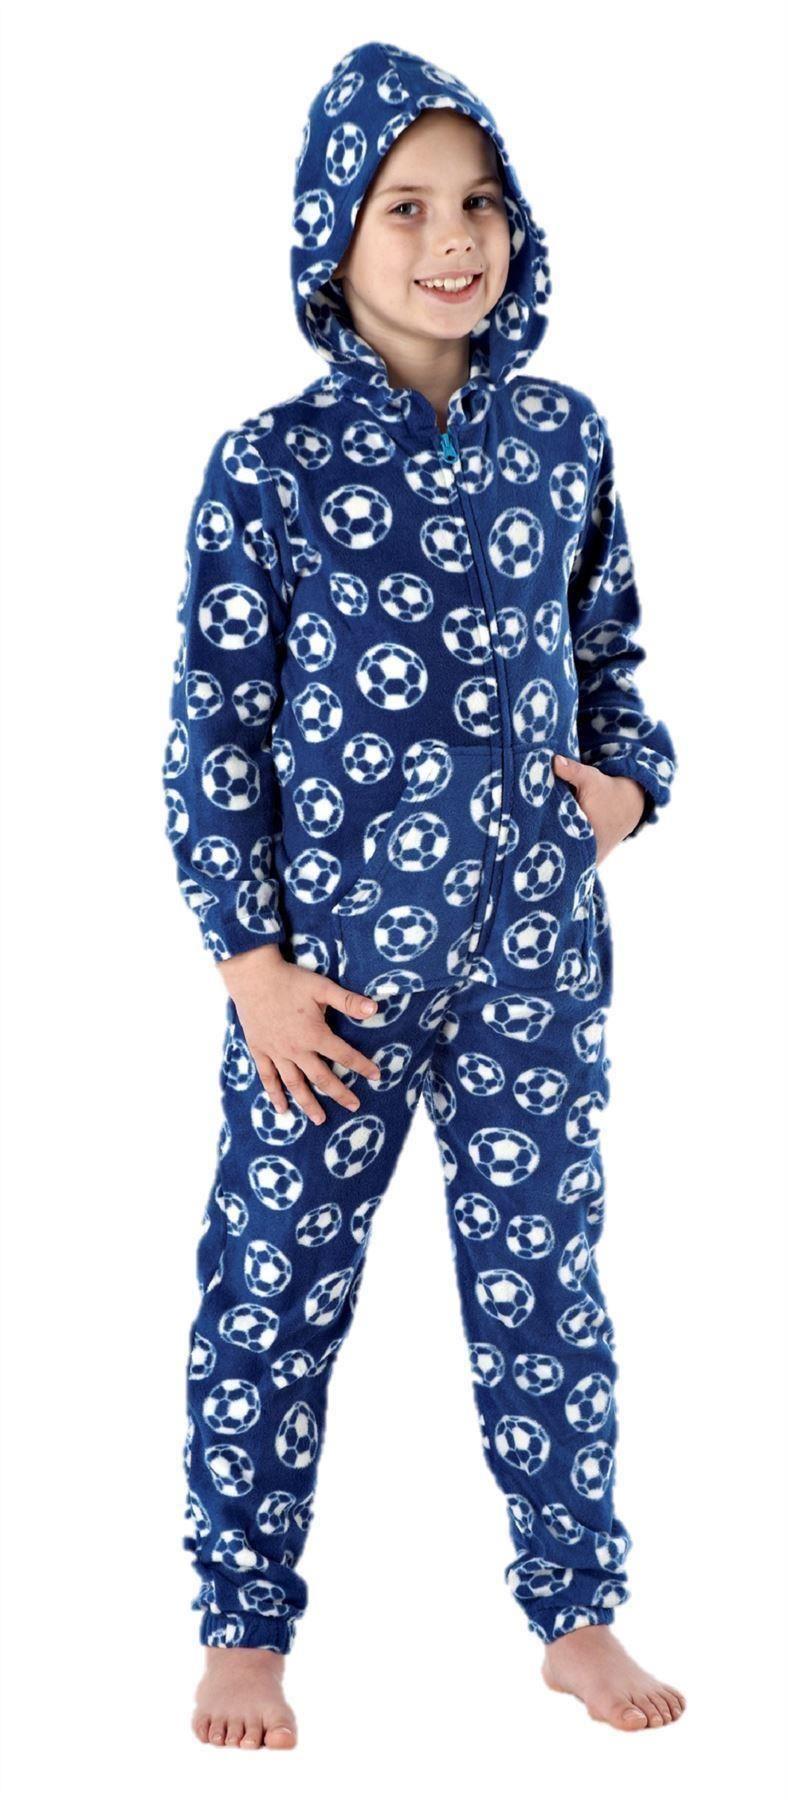 boys-all-in-one-sleepwear-pyjama-pajama-ones-one-piece-hoodie-FOOTBALL thumbnail 7